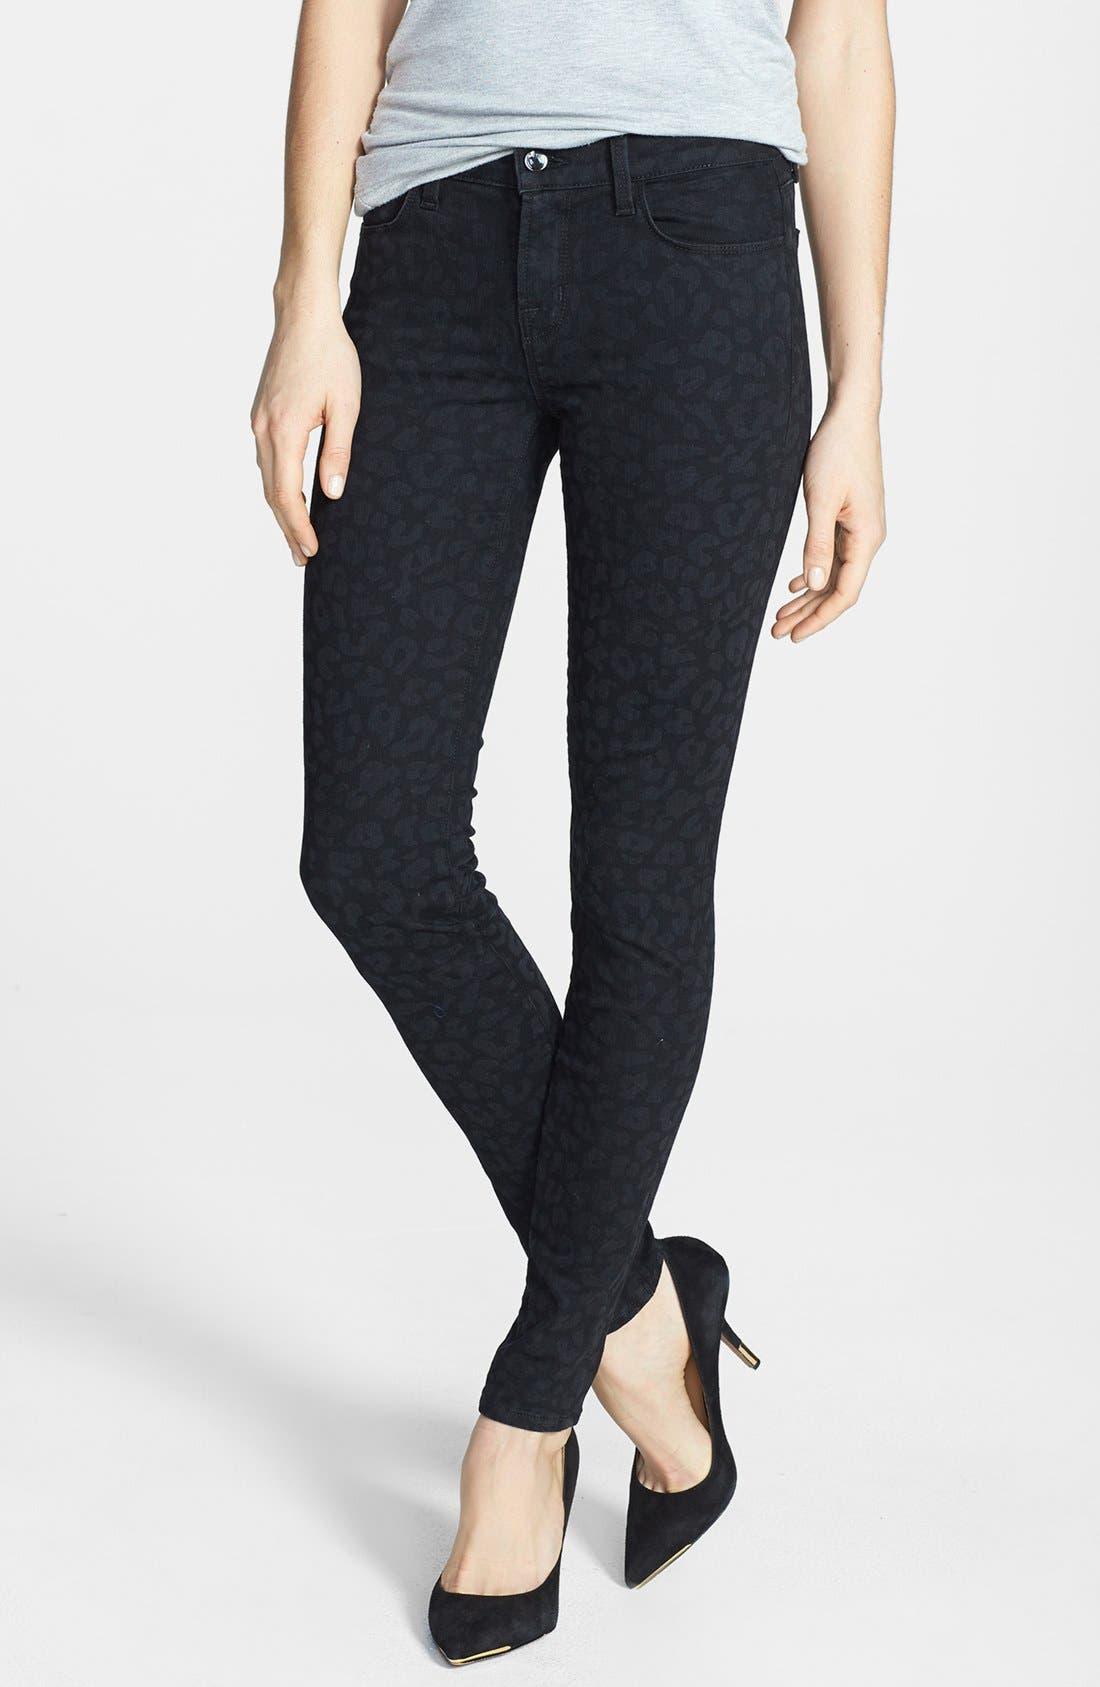 Alternate Image 1 Selected - J Brand '620' Mid Rise Skinny Jeans (Black Leopard)